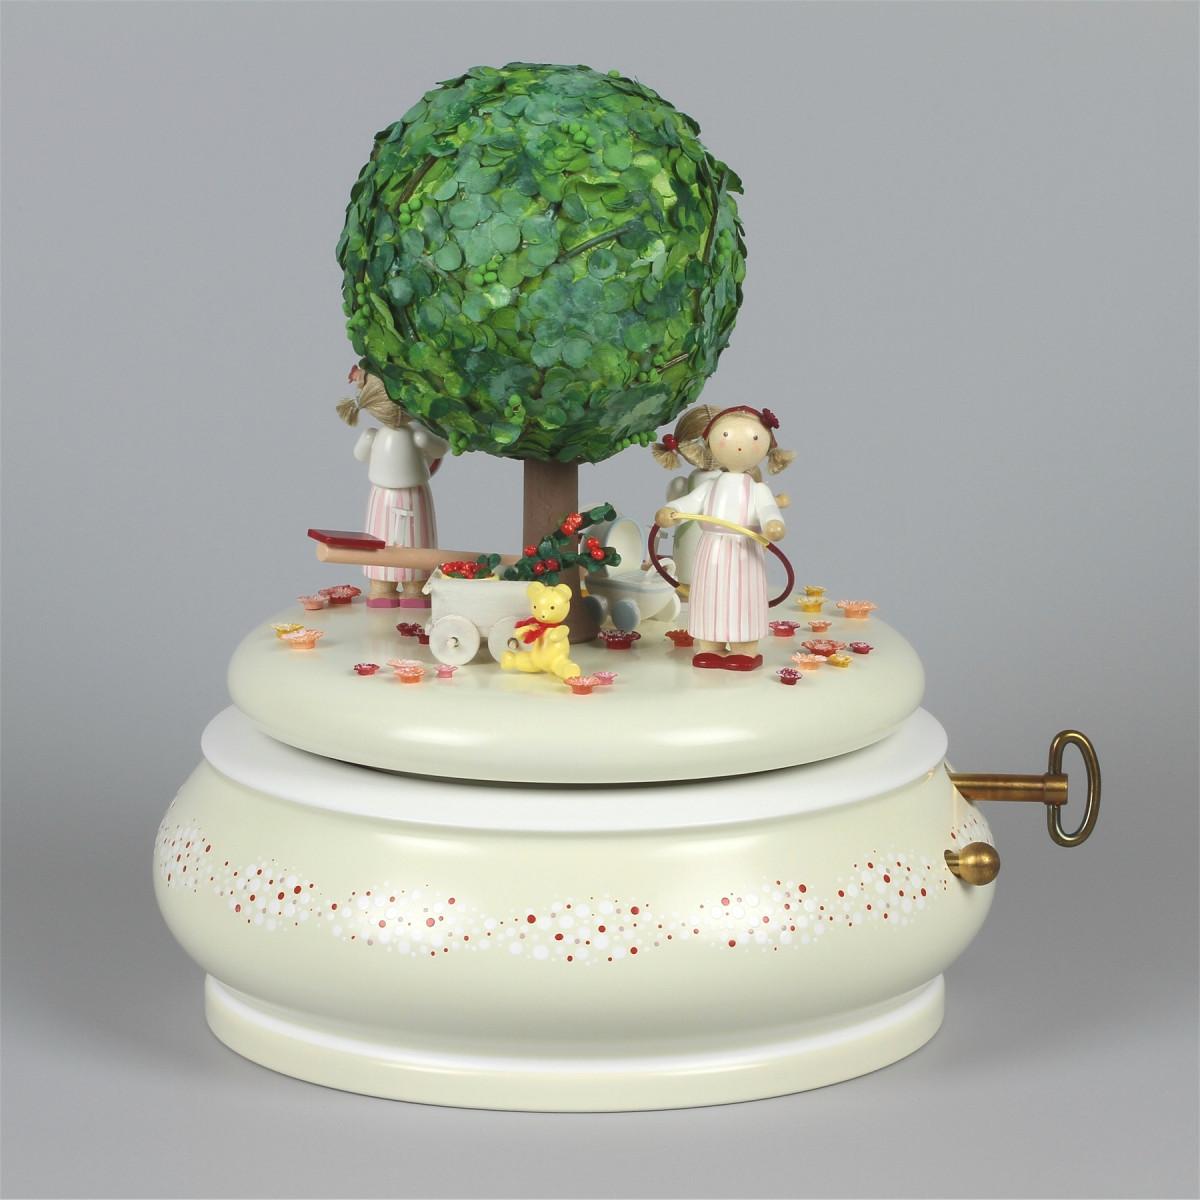 spieldose der alte apfelbaum sommer erzgebirgskunst drechsel. Black Bedroom Furniture Sets. Home Design Ideas